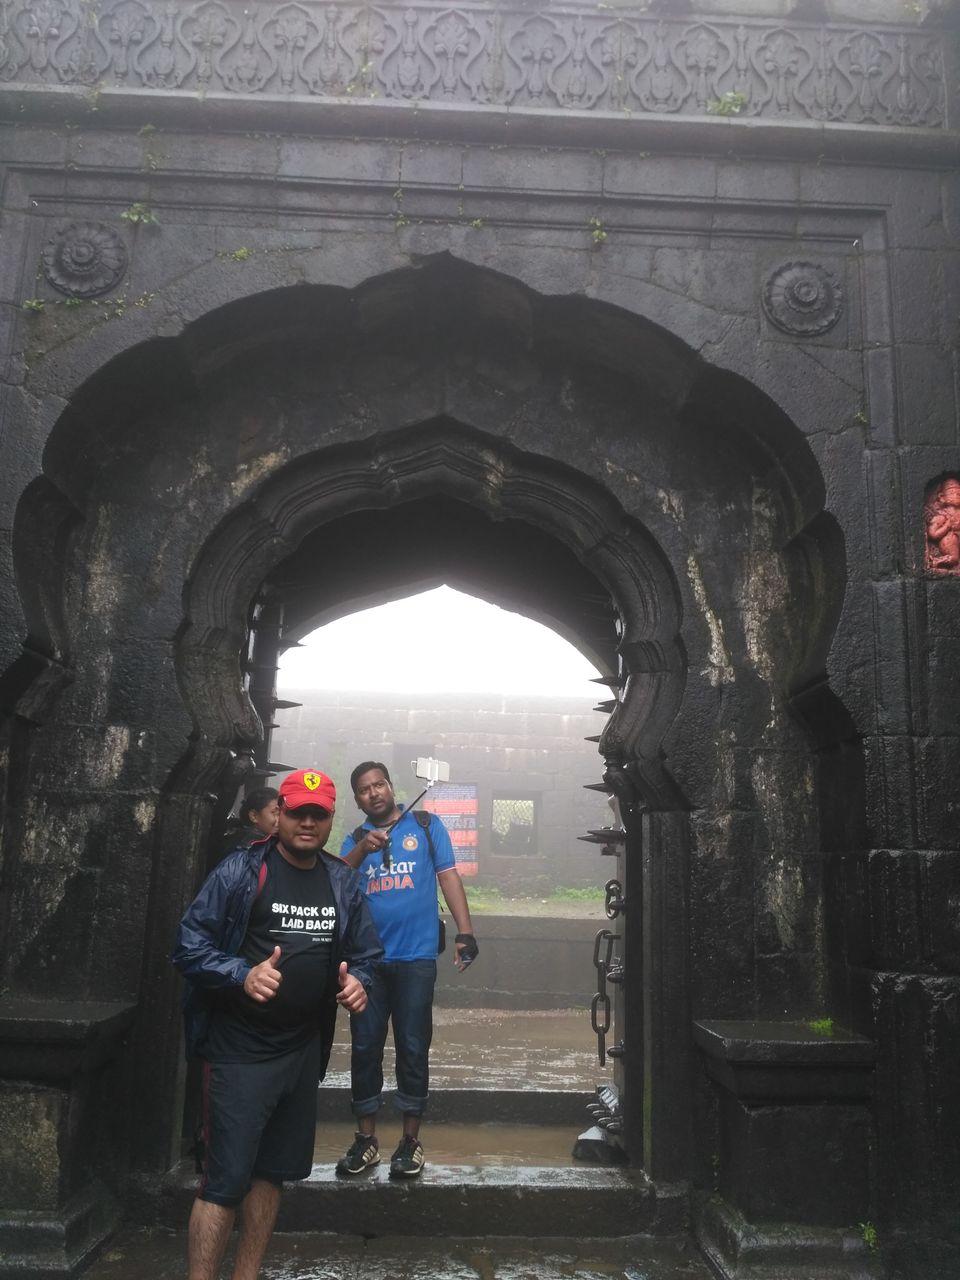 Photos of Lohagad Monsoon Trek - A must do! 7/17 by Prahlad Raj